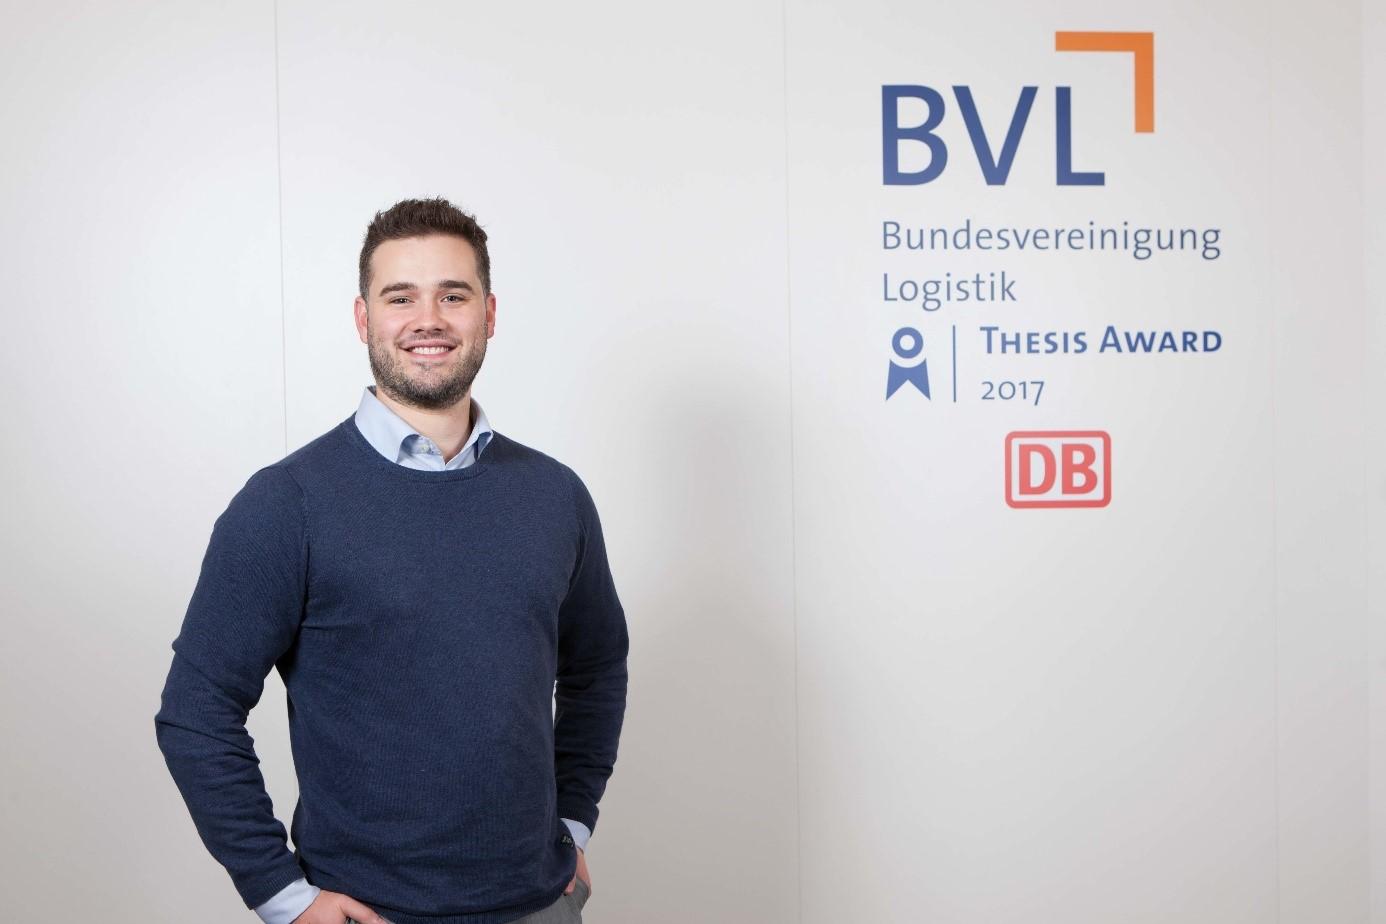 bvl thesis award 2015